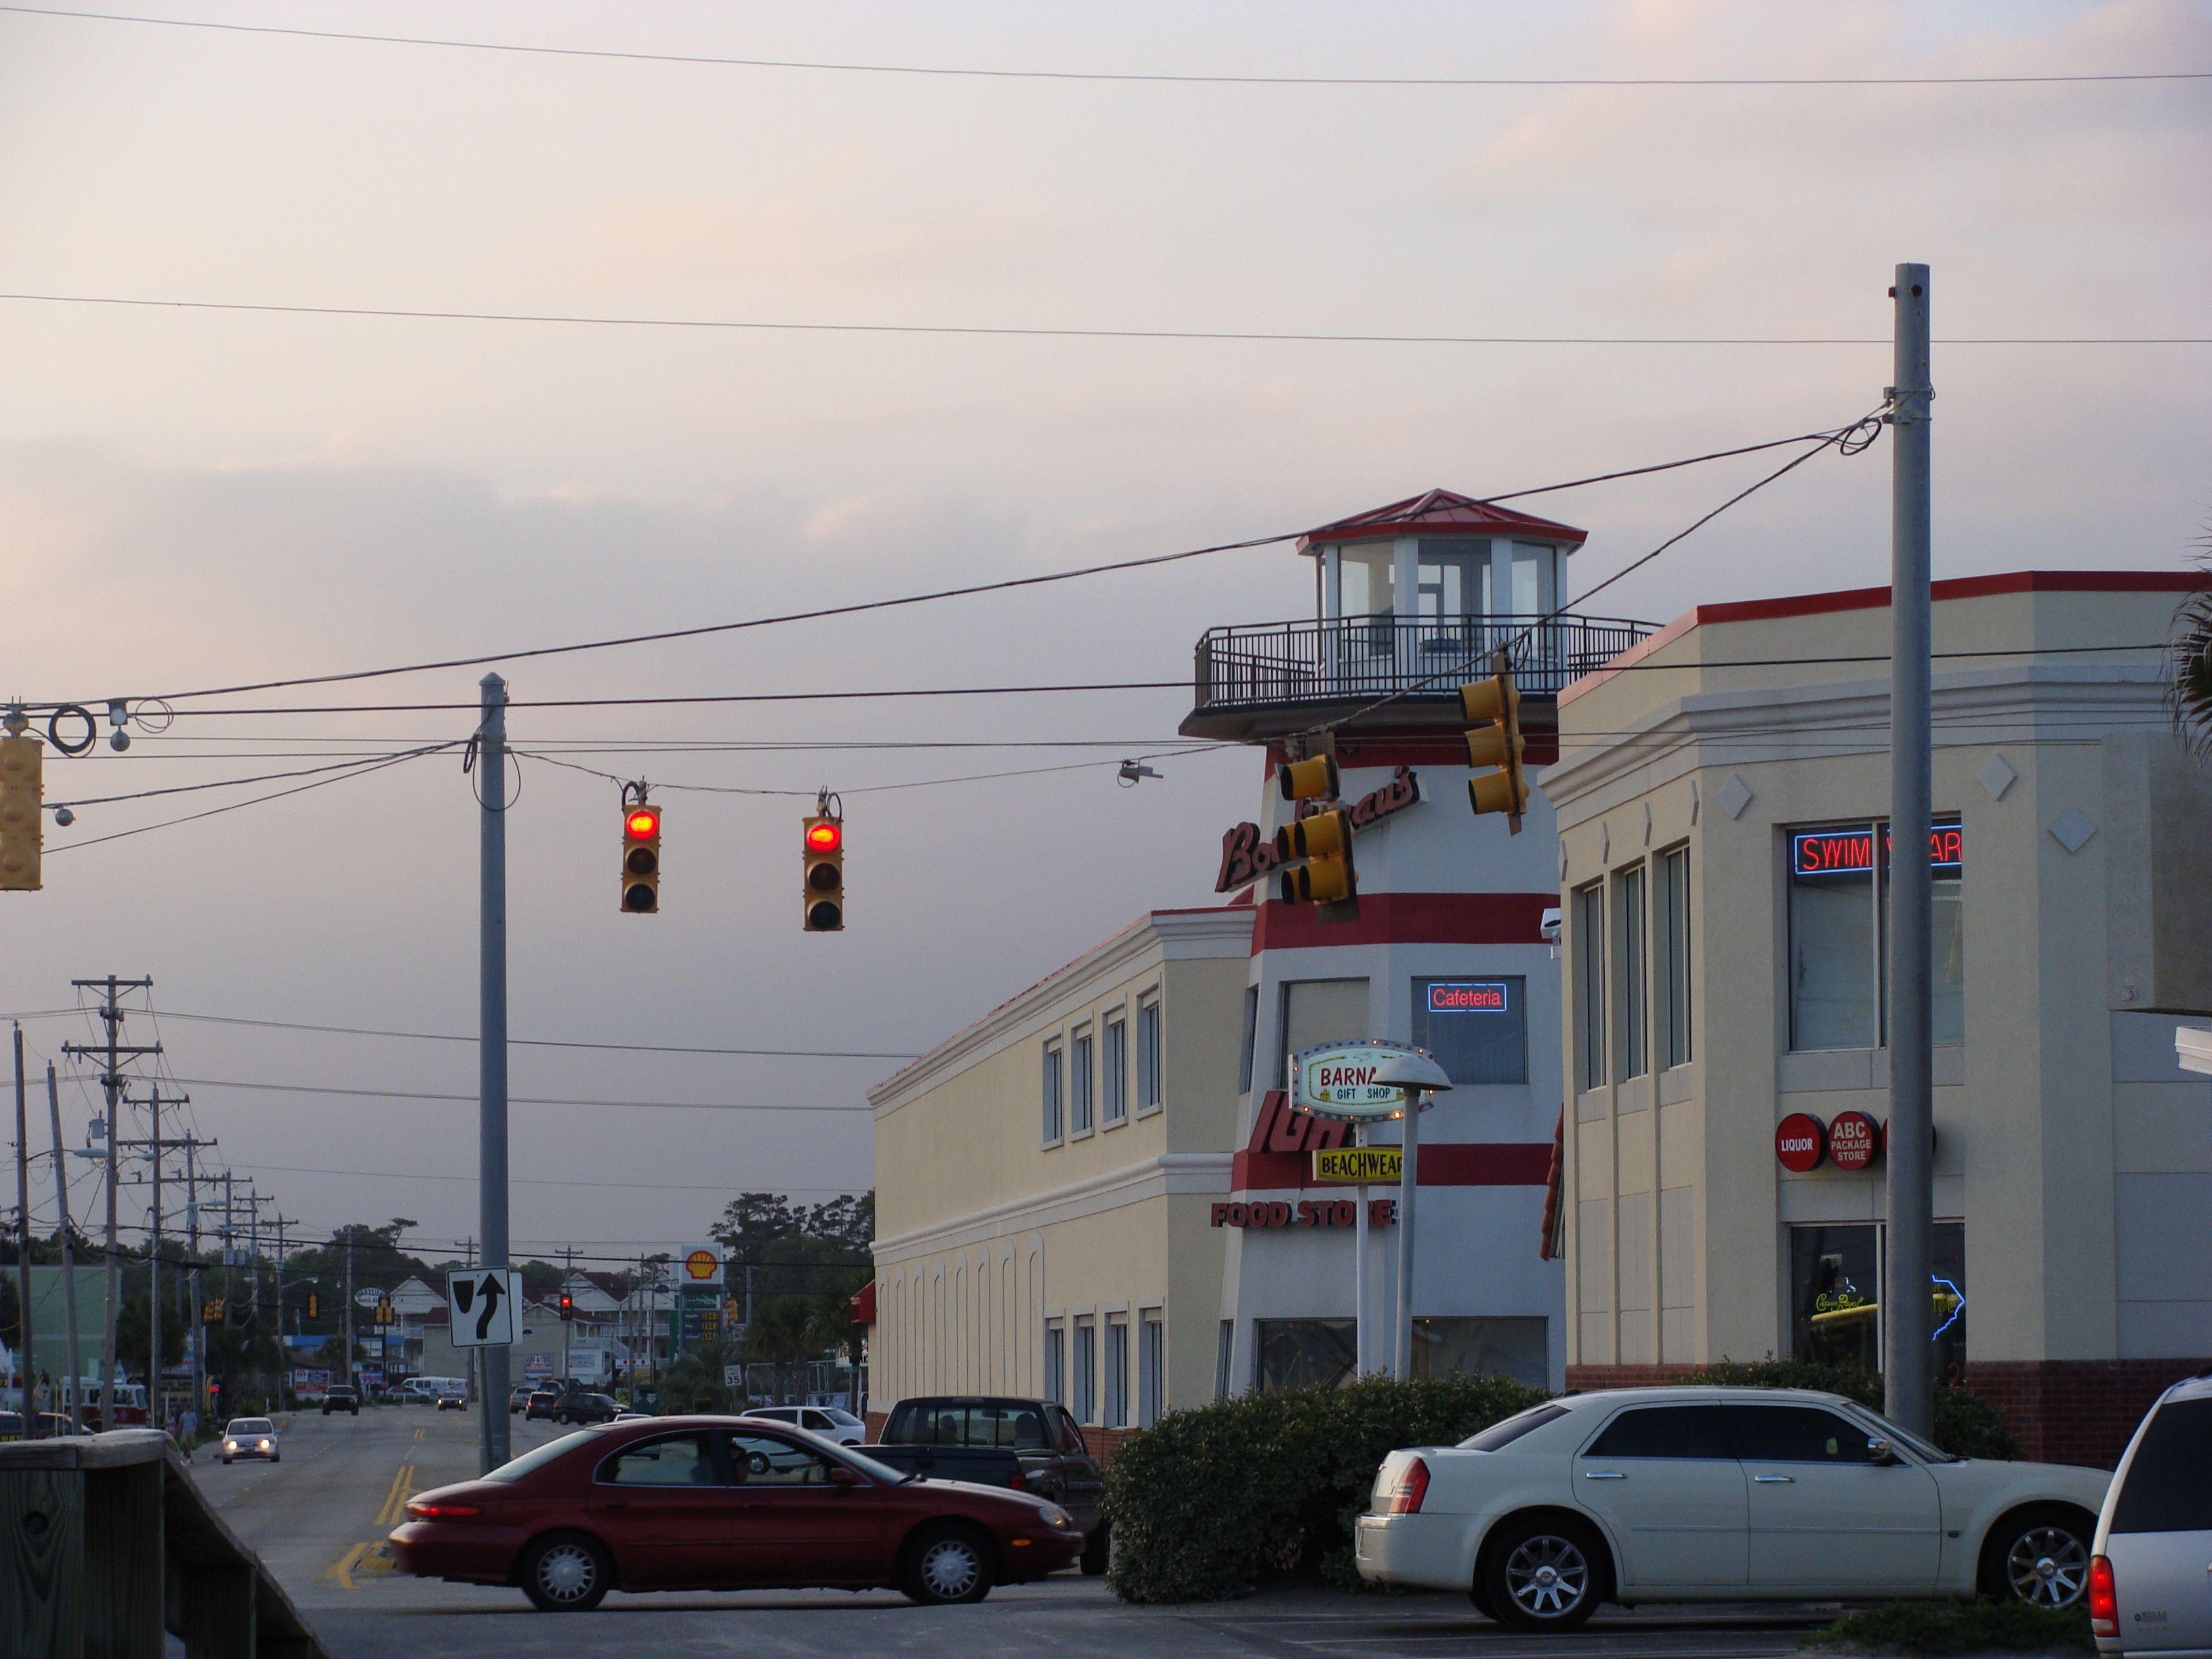 Boulineau S Street View Views Scenes